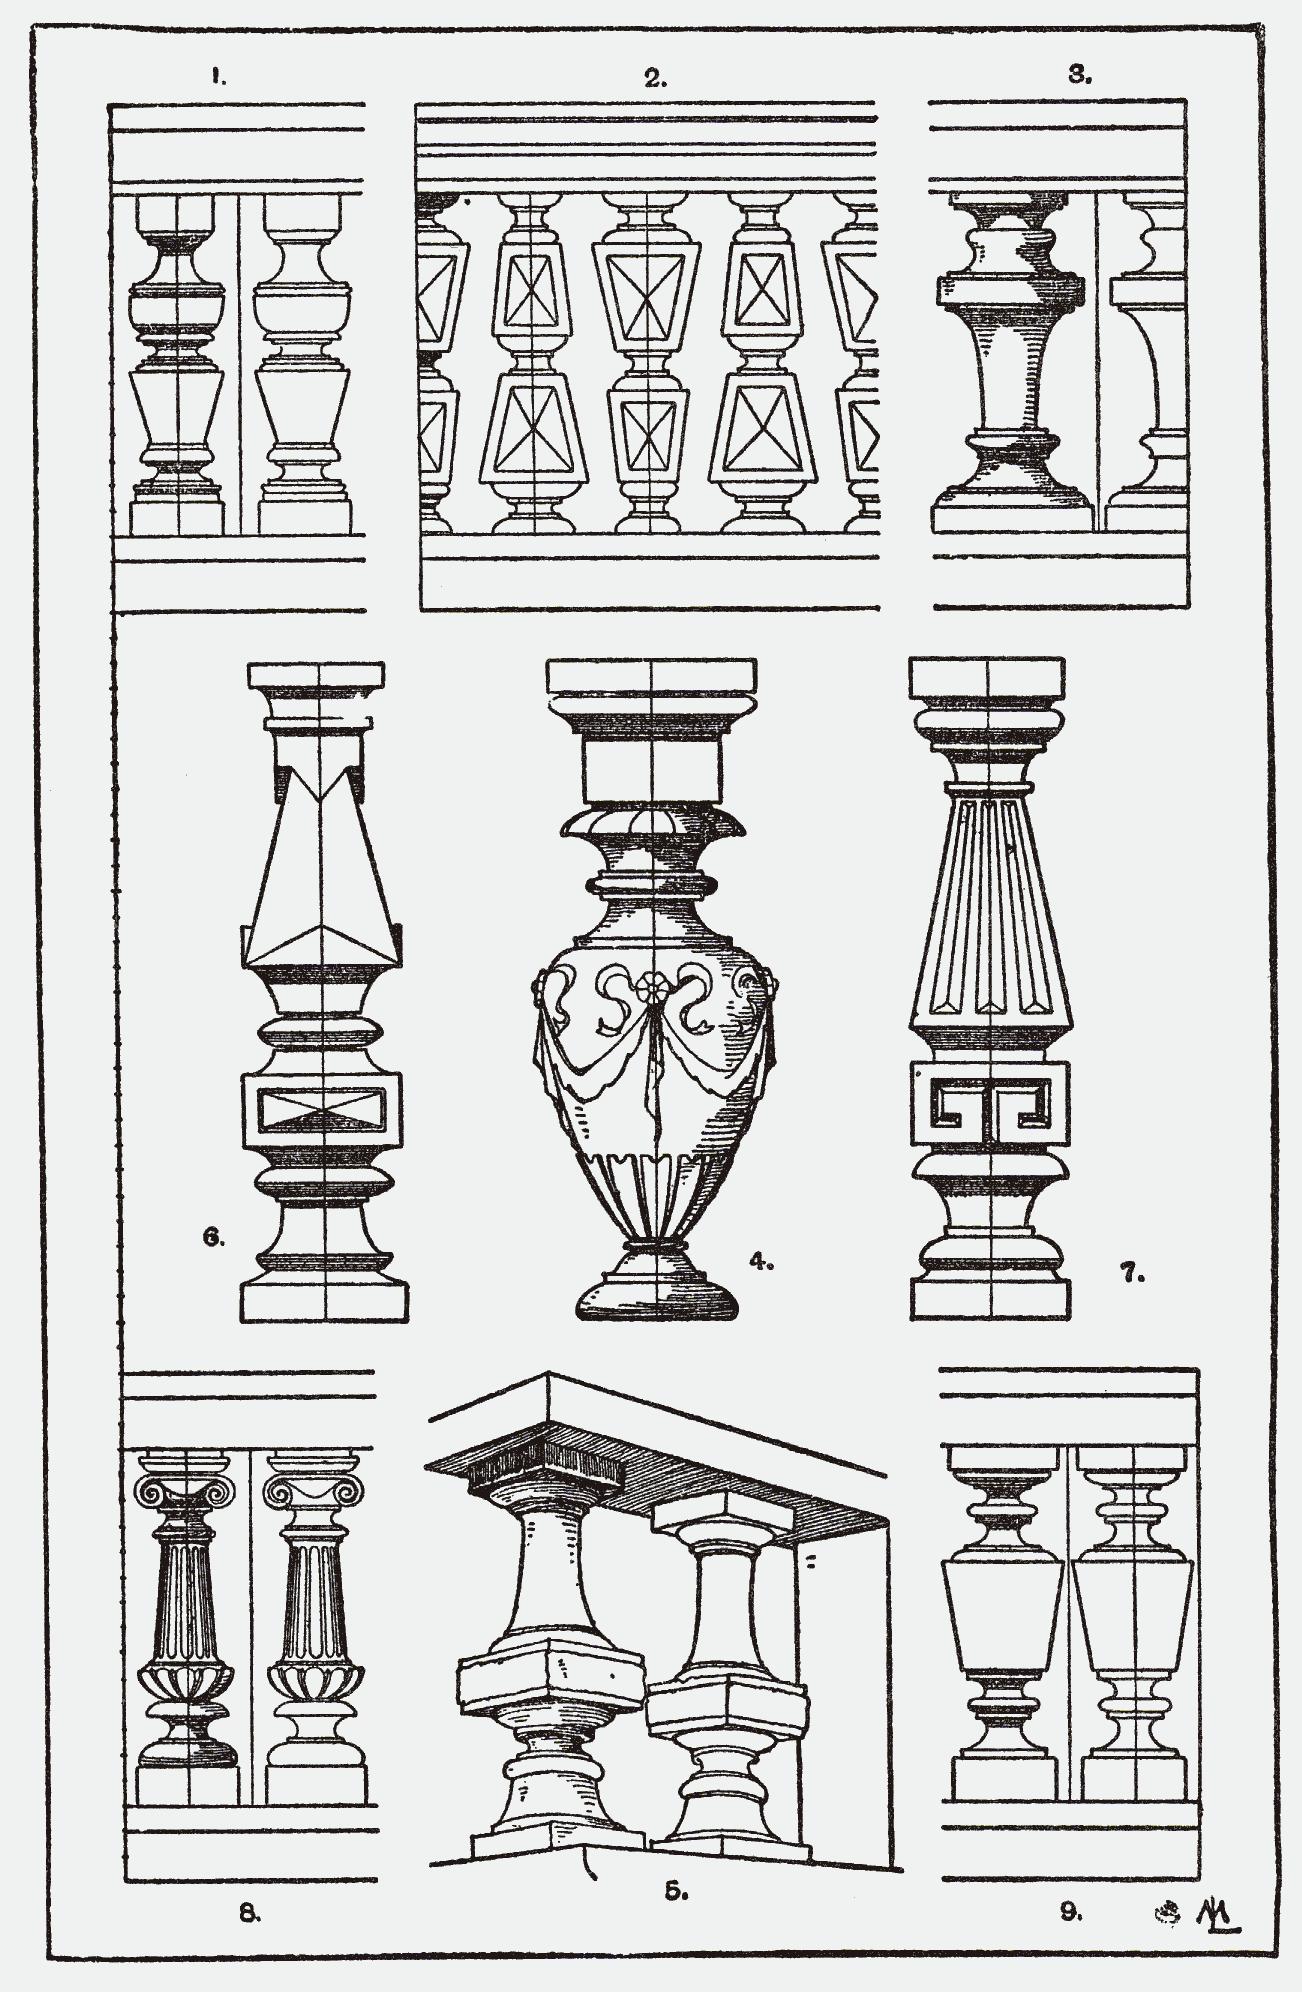 Depiction of Balaustre